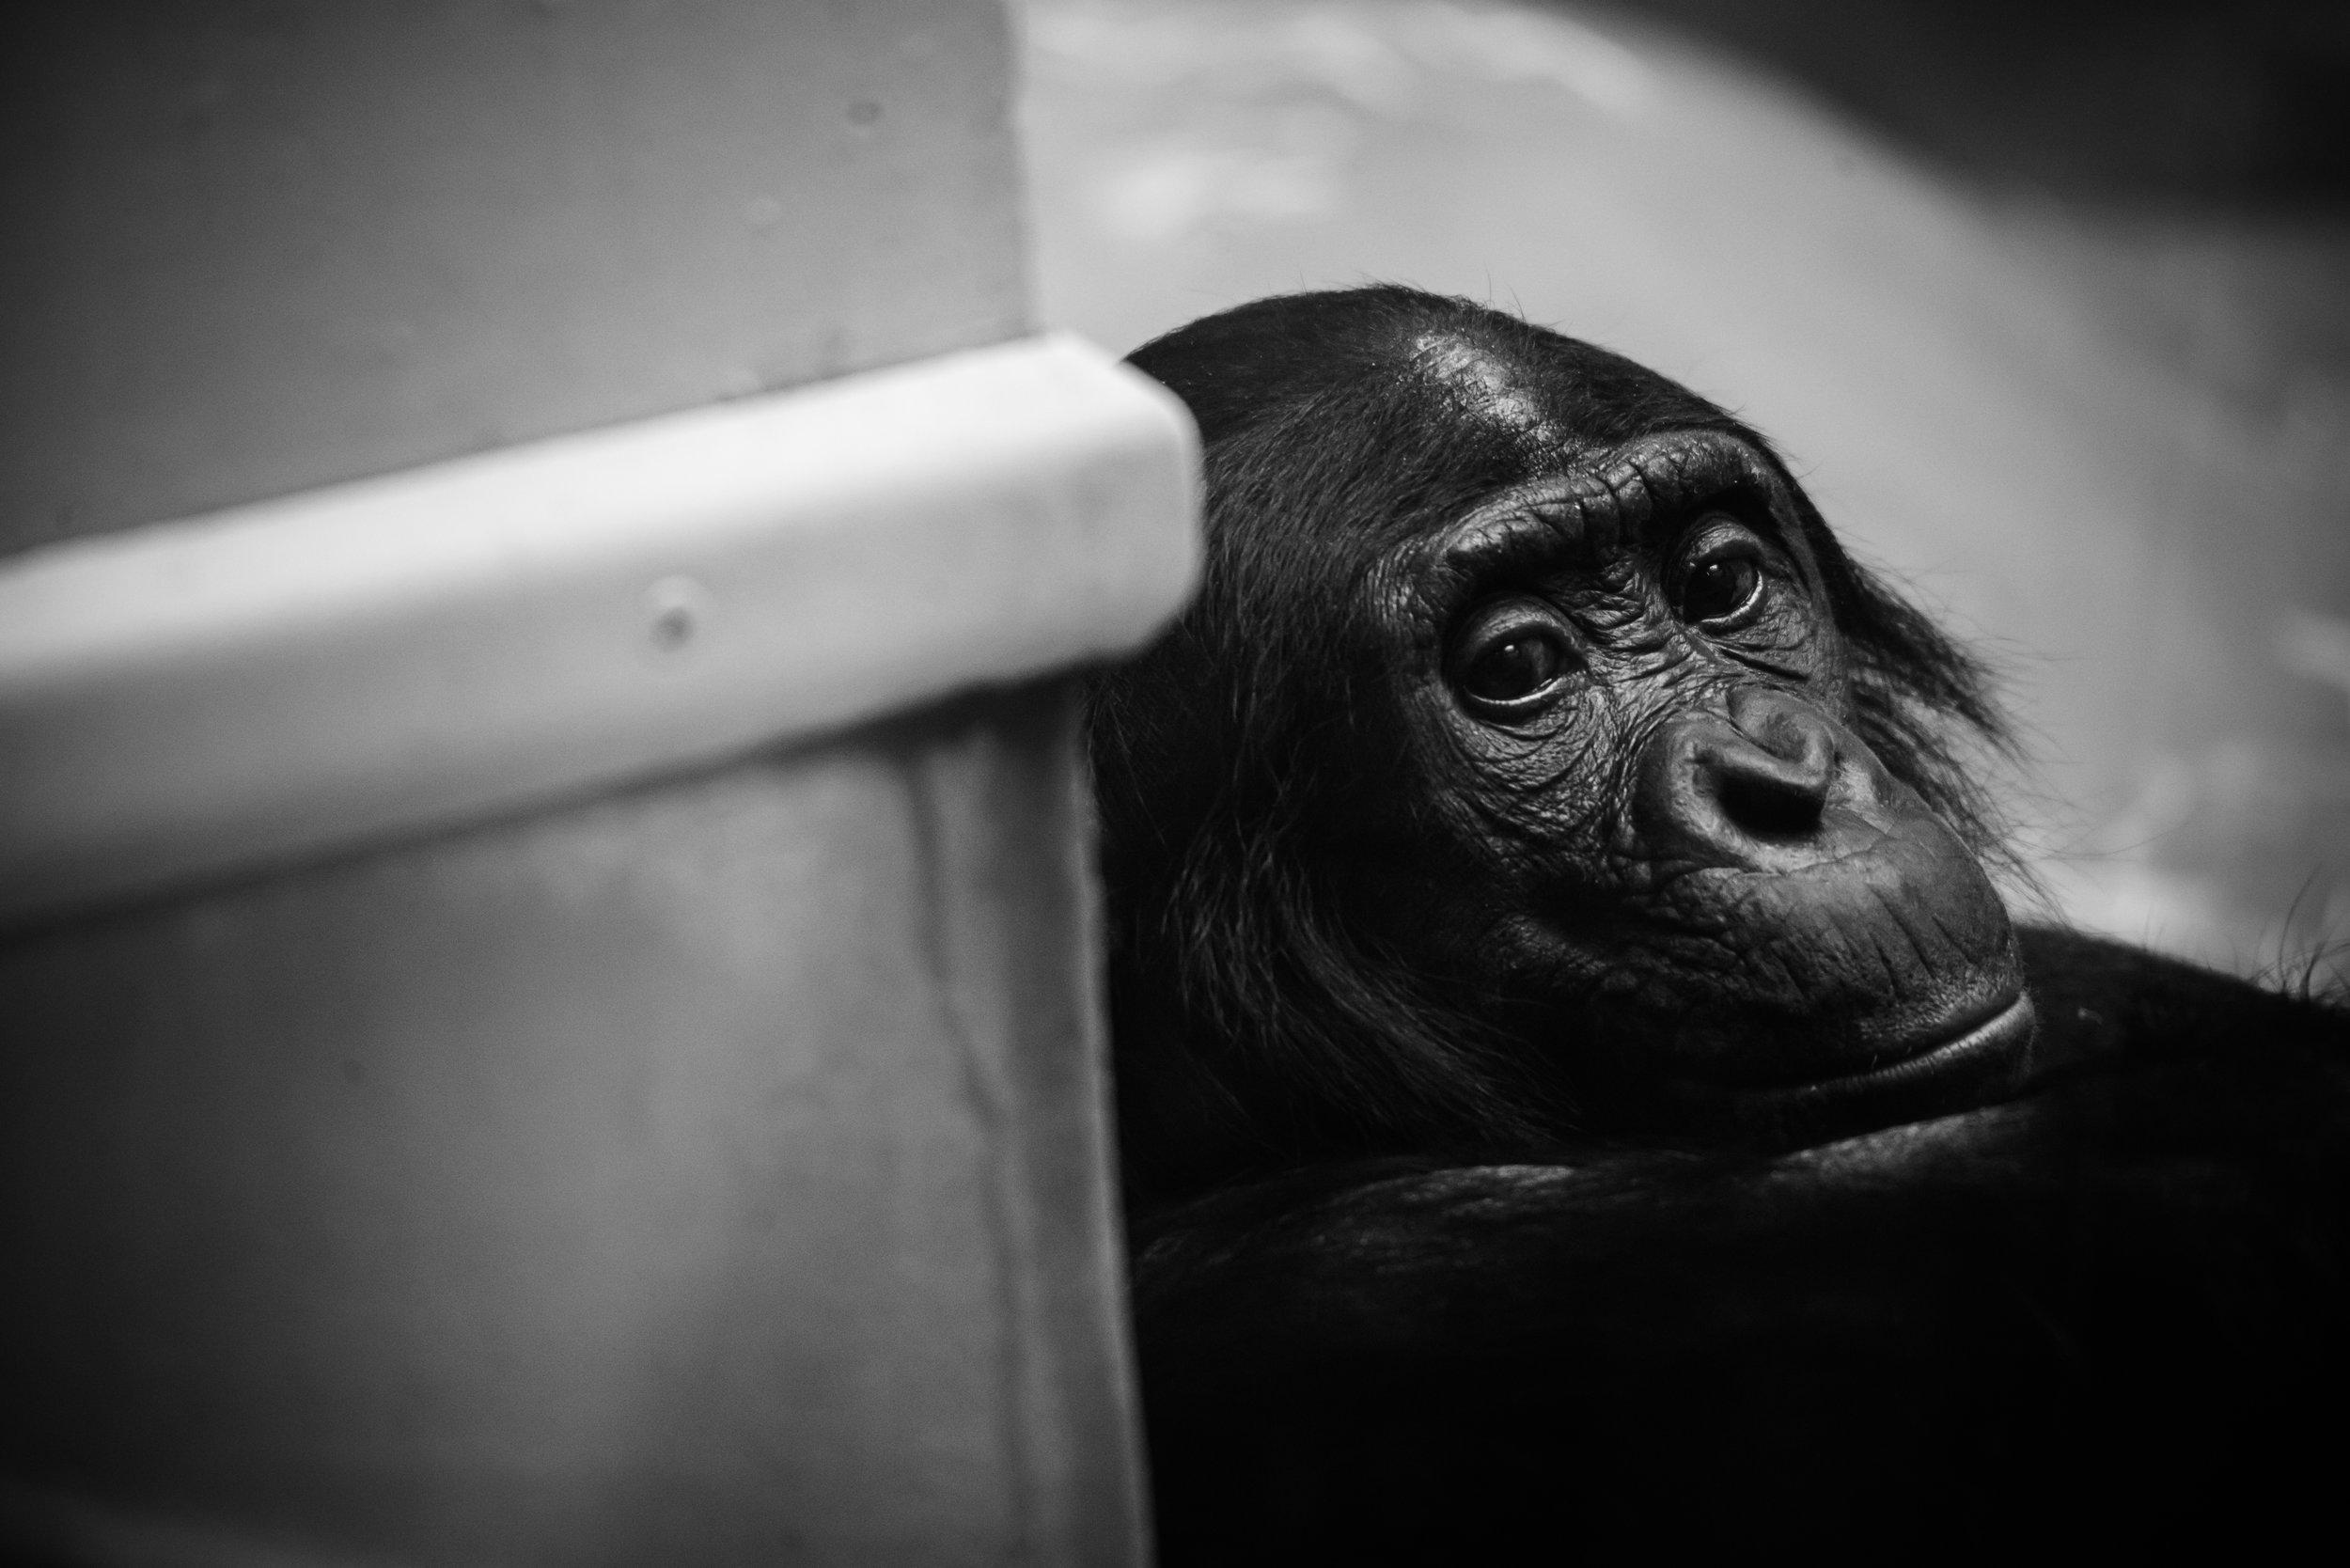 Chimpanzee 2 in a Zoo.jpg